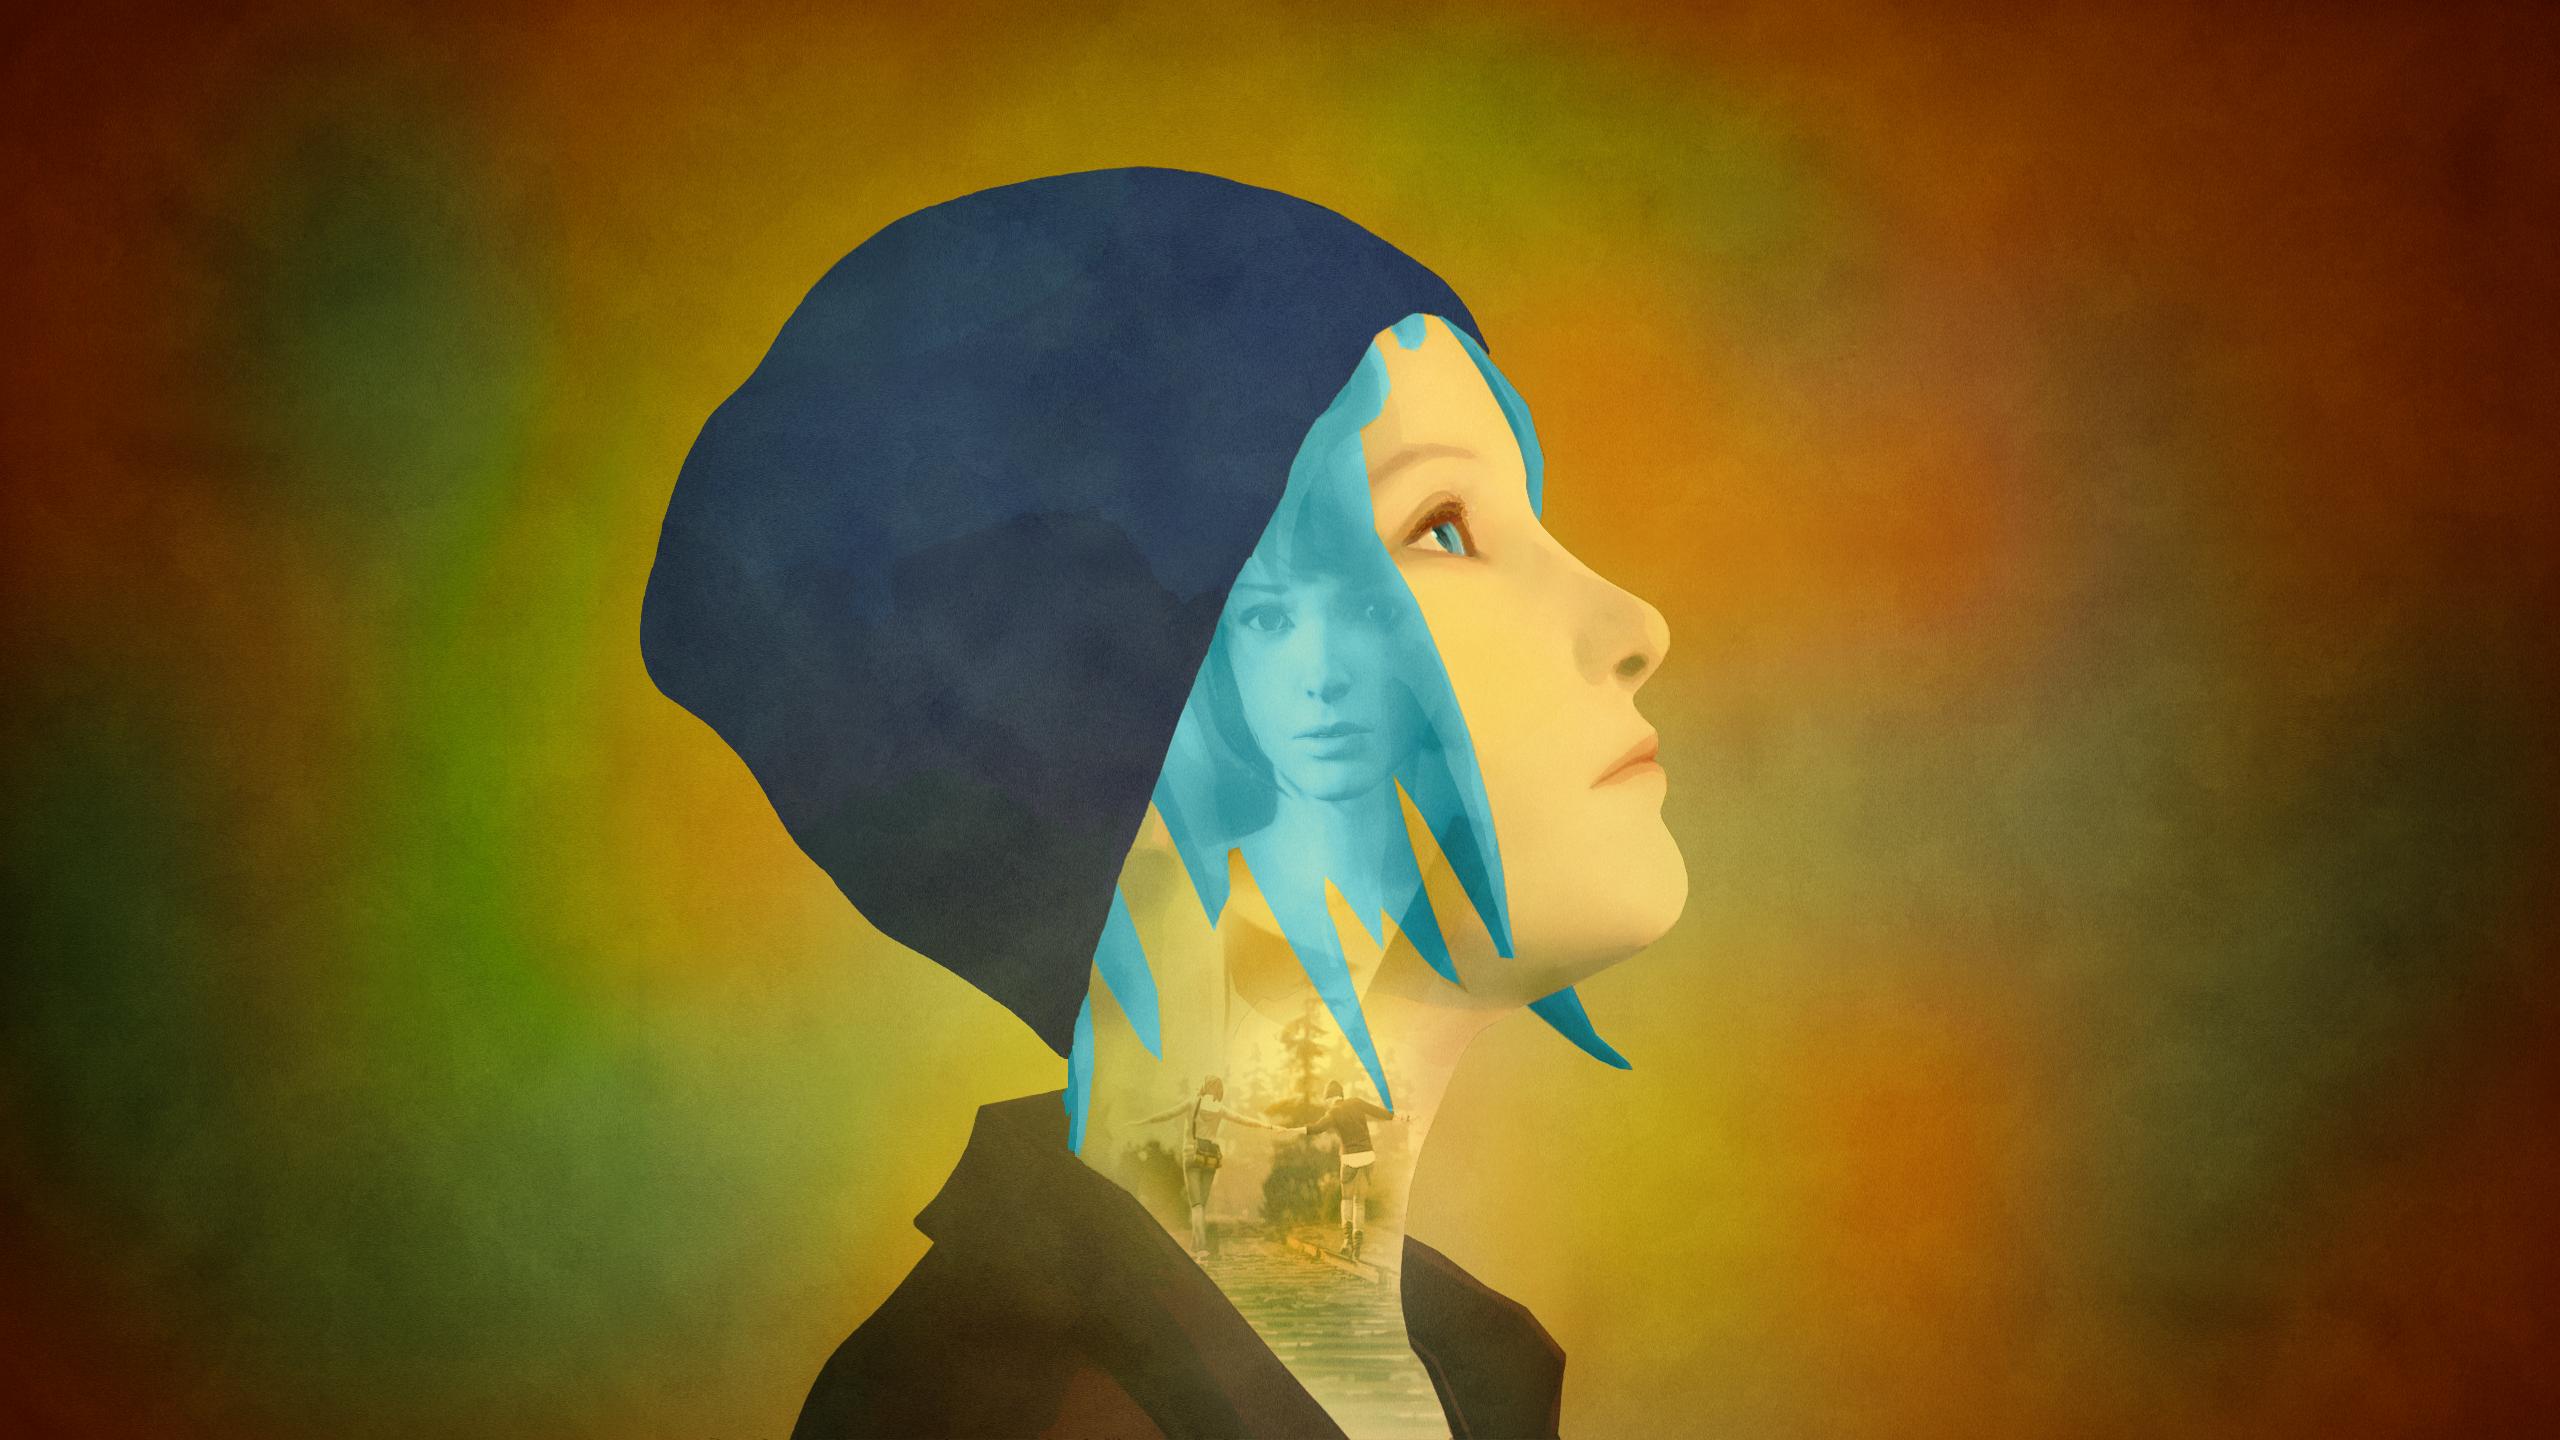 Life Is Strange - Chloe Wallpaper (No logo) by RockLou